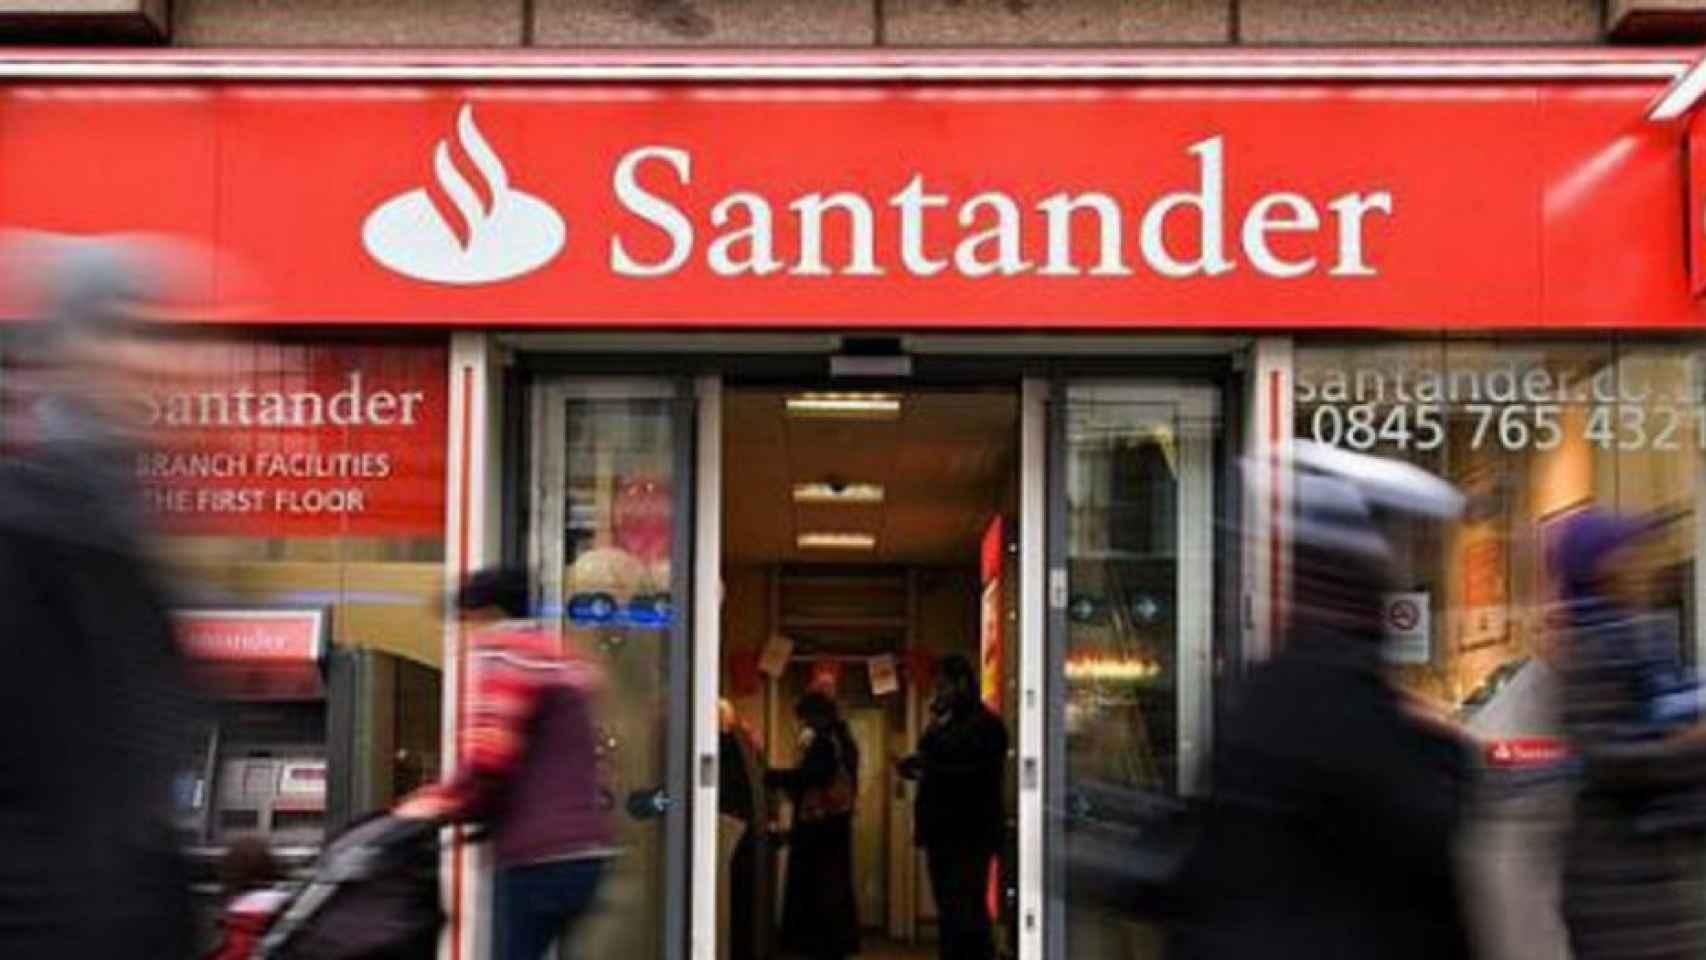 Imagen de una sucursal de Santander UK.